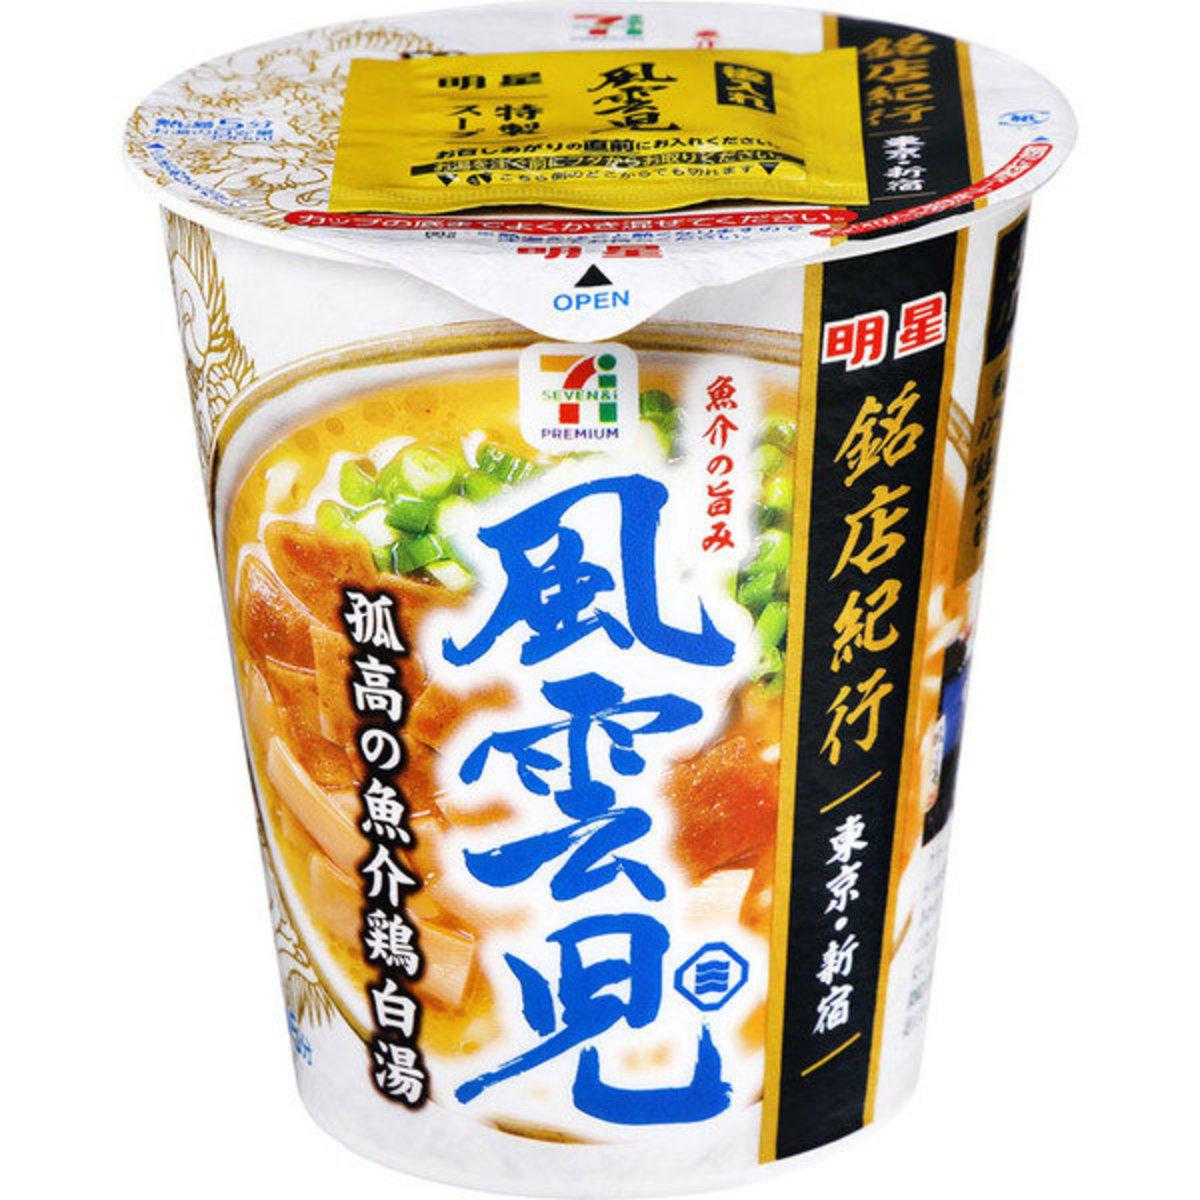 Japan Seven Premium Shinjuku Fuunji Seafood Chicken White Soup Noodles x 12pcs